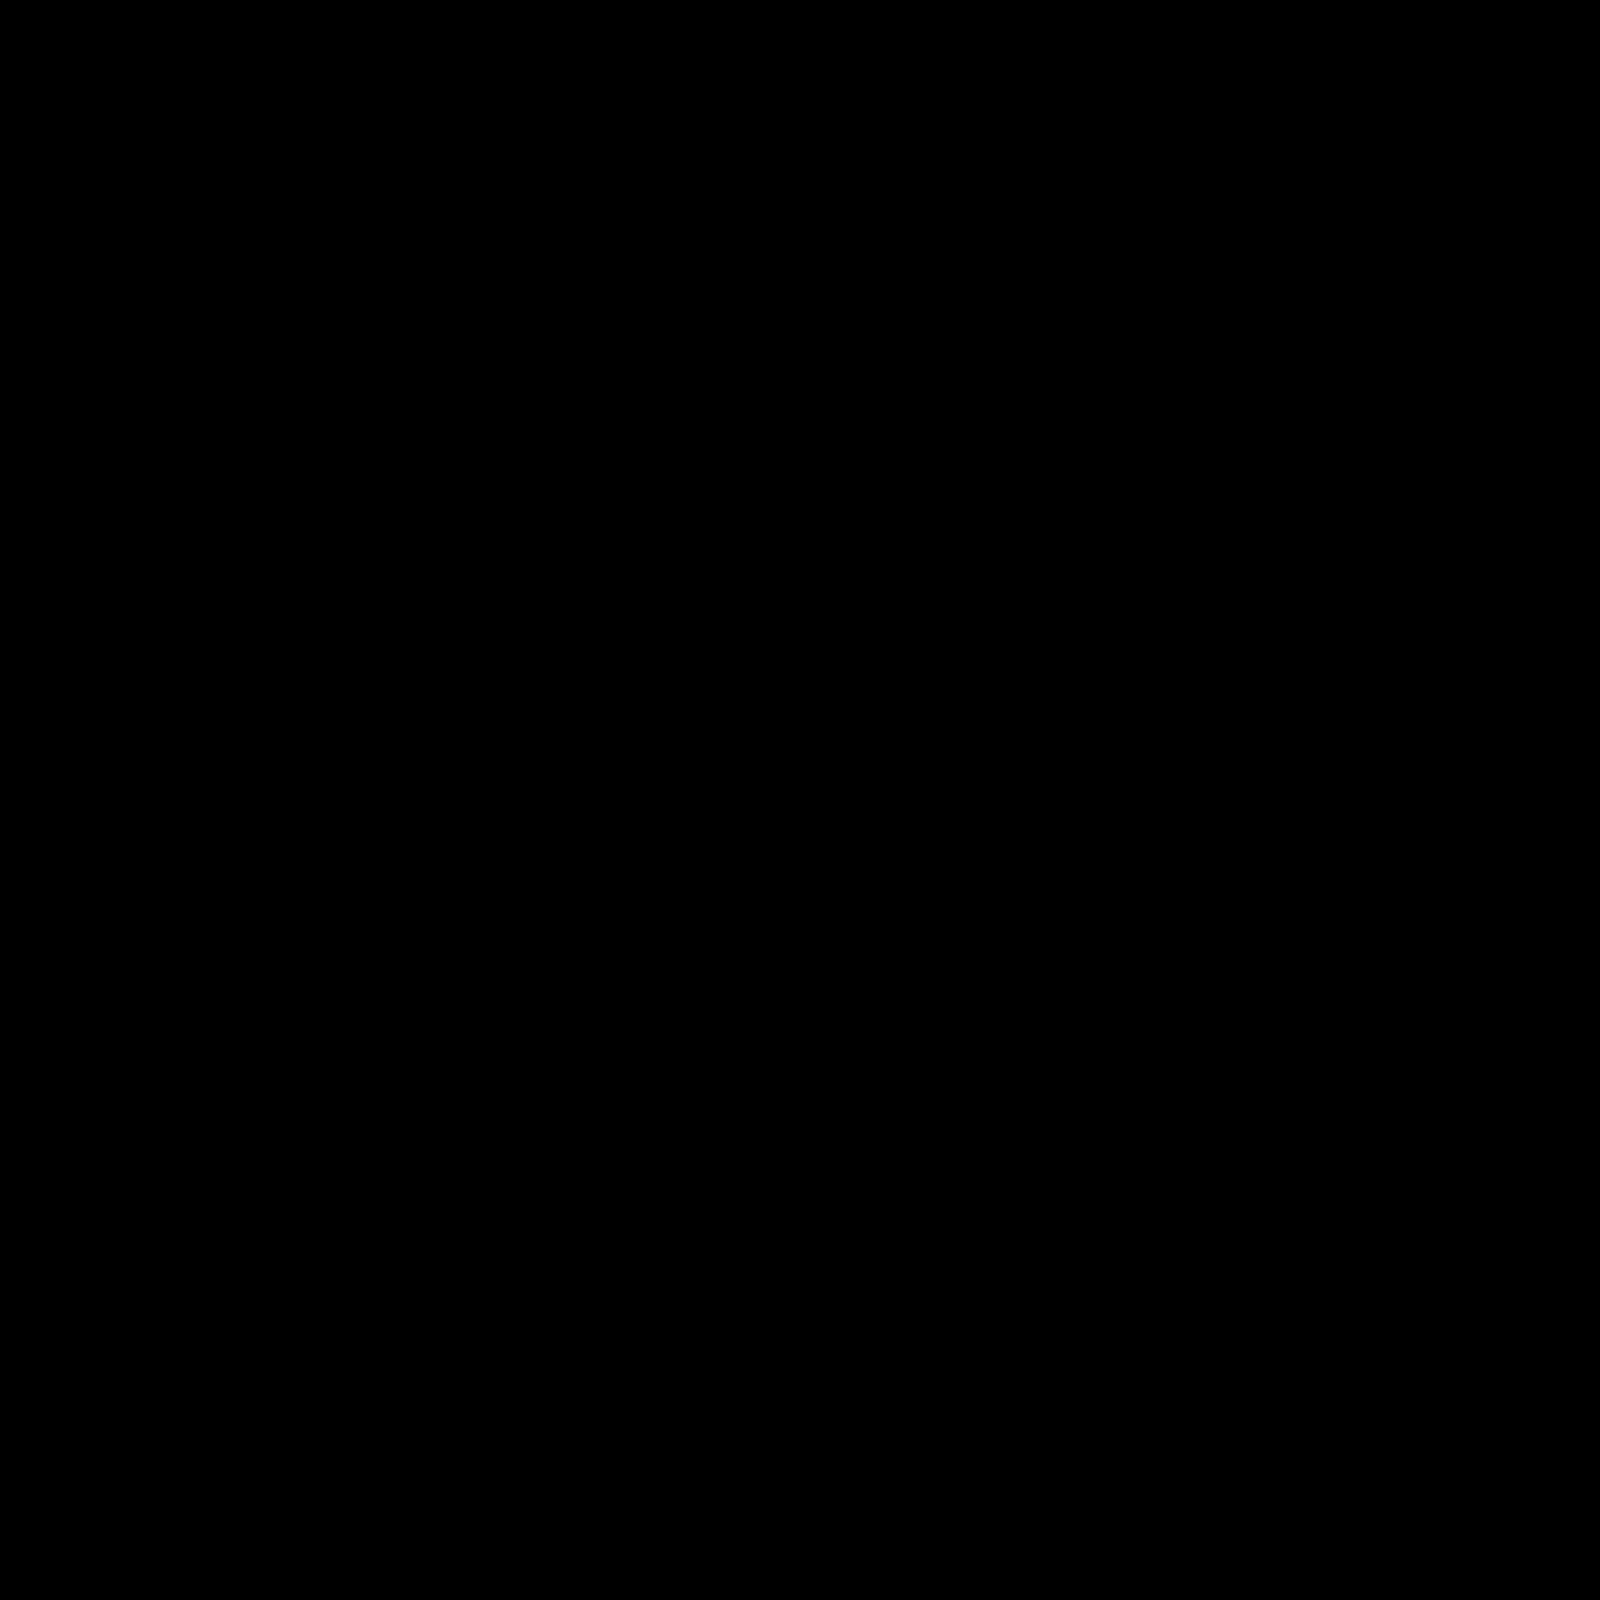 Dog icon free download. Bone clipart emoji